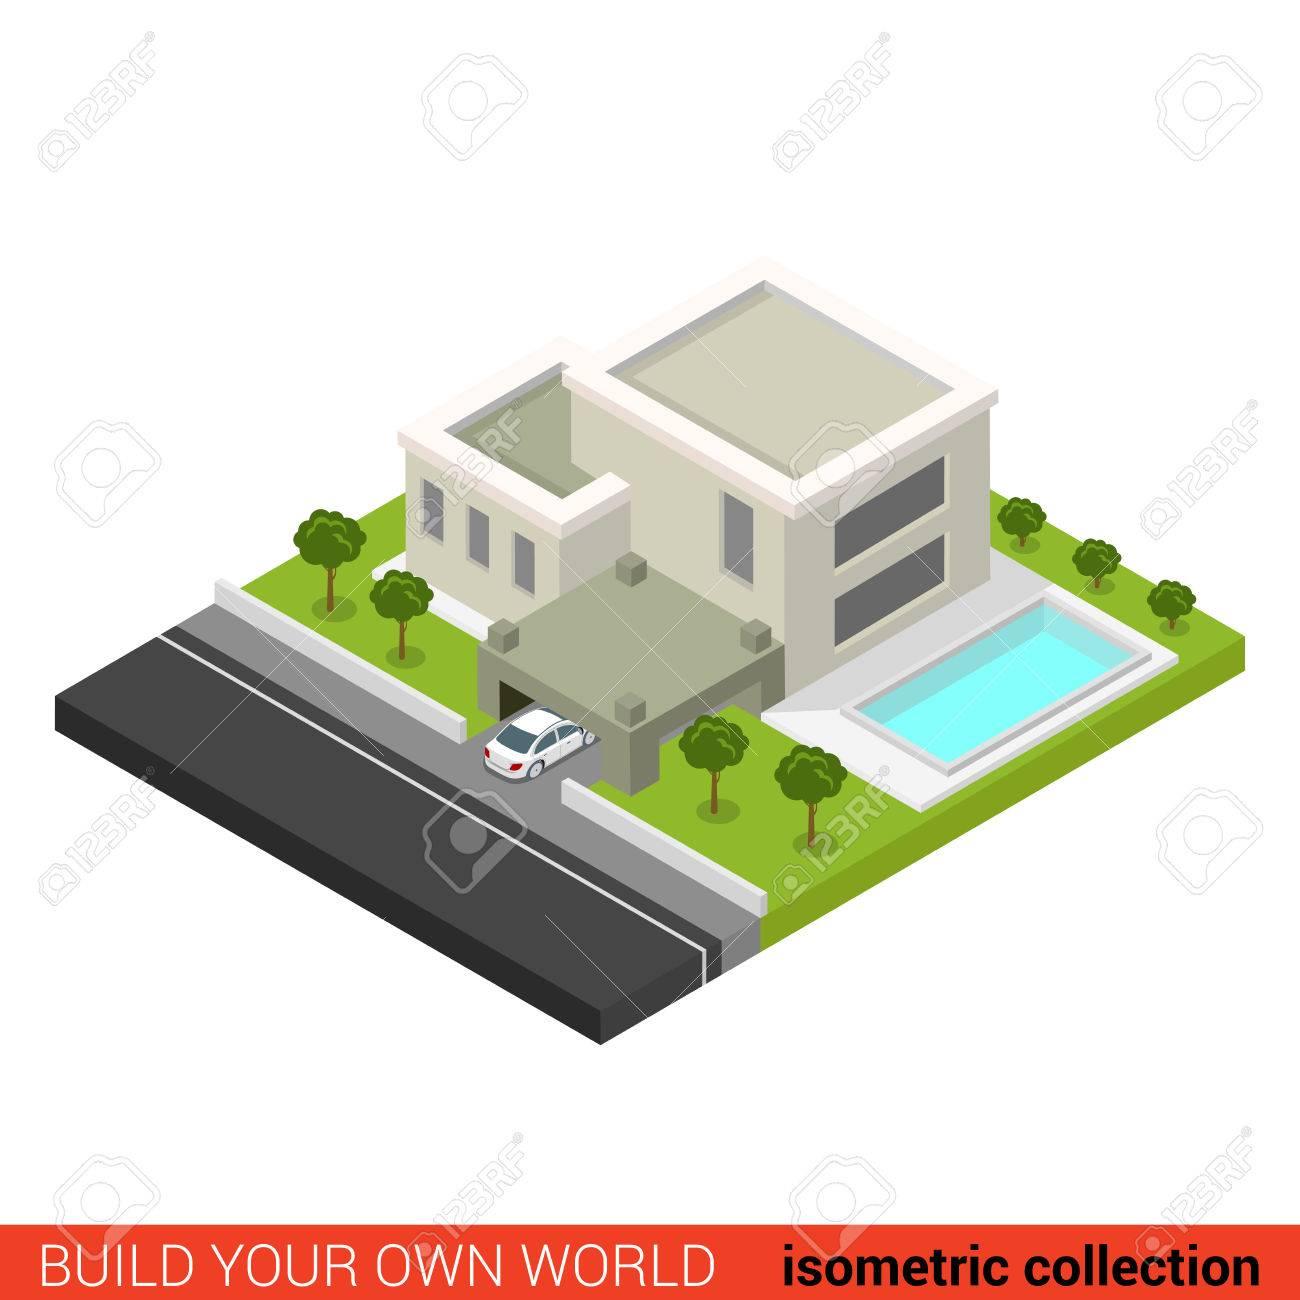 Flat 3d Isometric Creative Modern Stylish Family House Car Parking Backyard  Pool Building Block Info Graphic